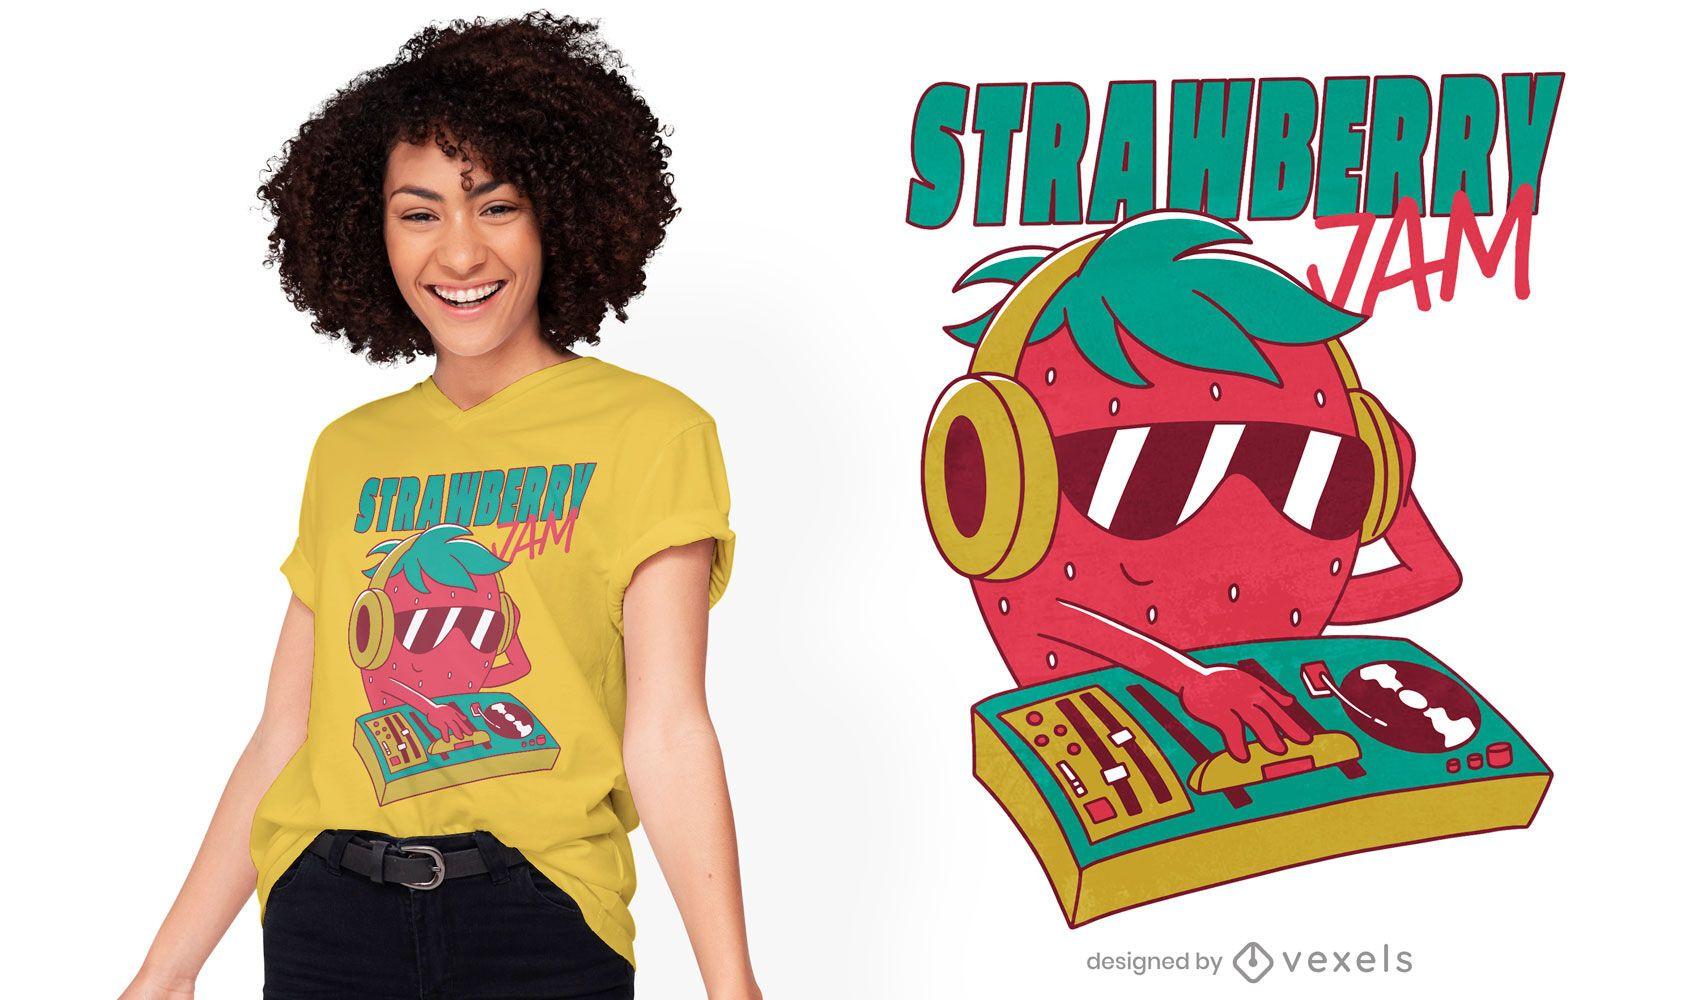 Dj strawberry t-shirt design